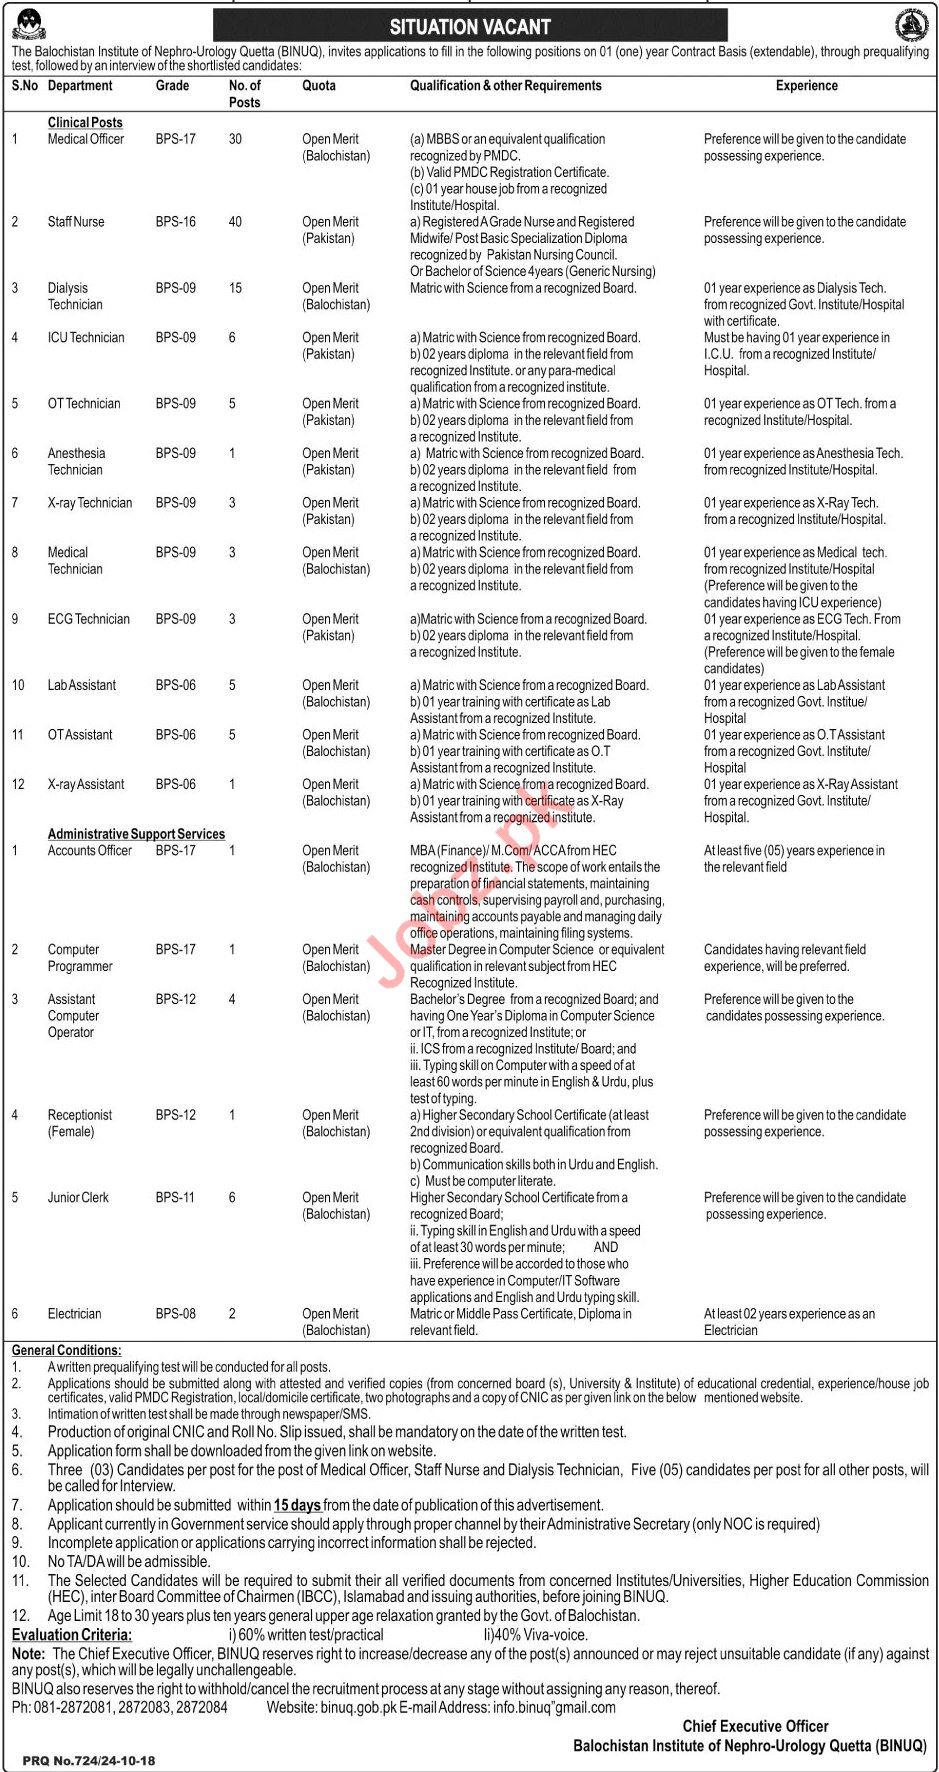 Balochistan Institute of Nephro-Urology Quetta BINUQ Jobs